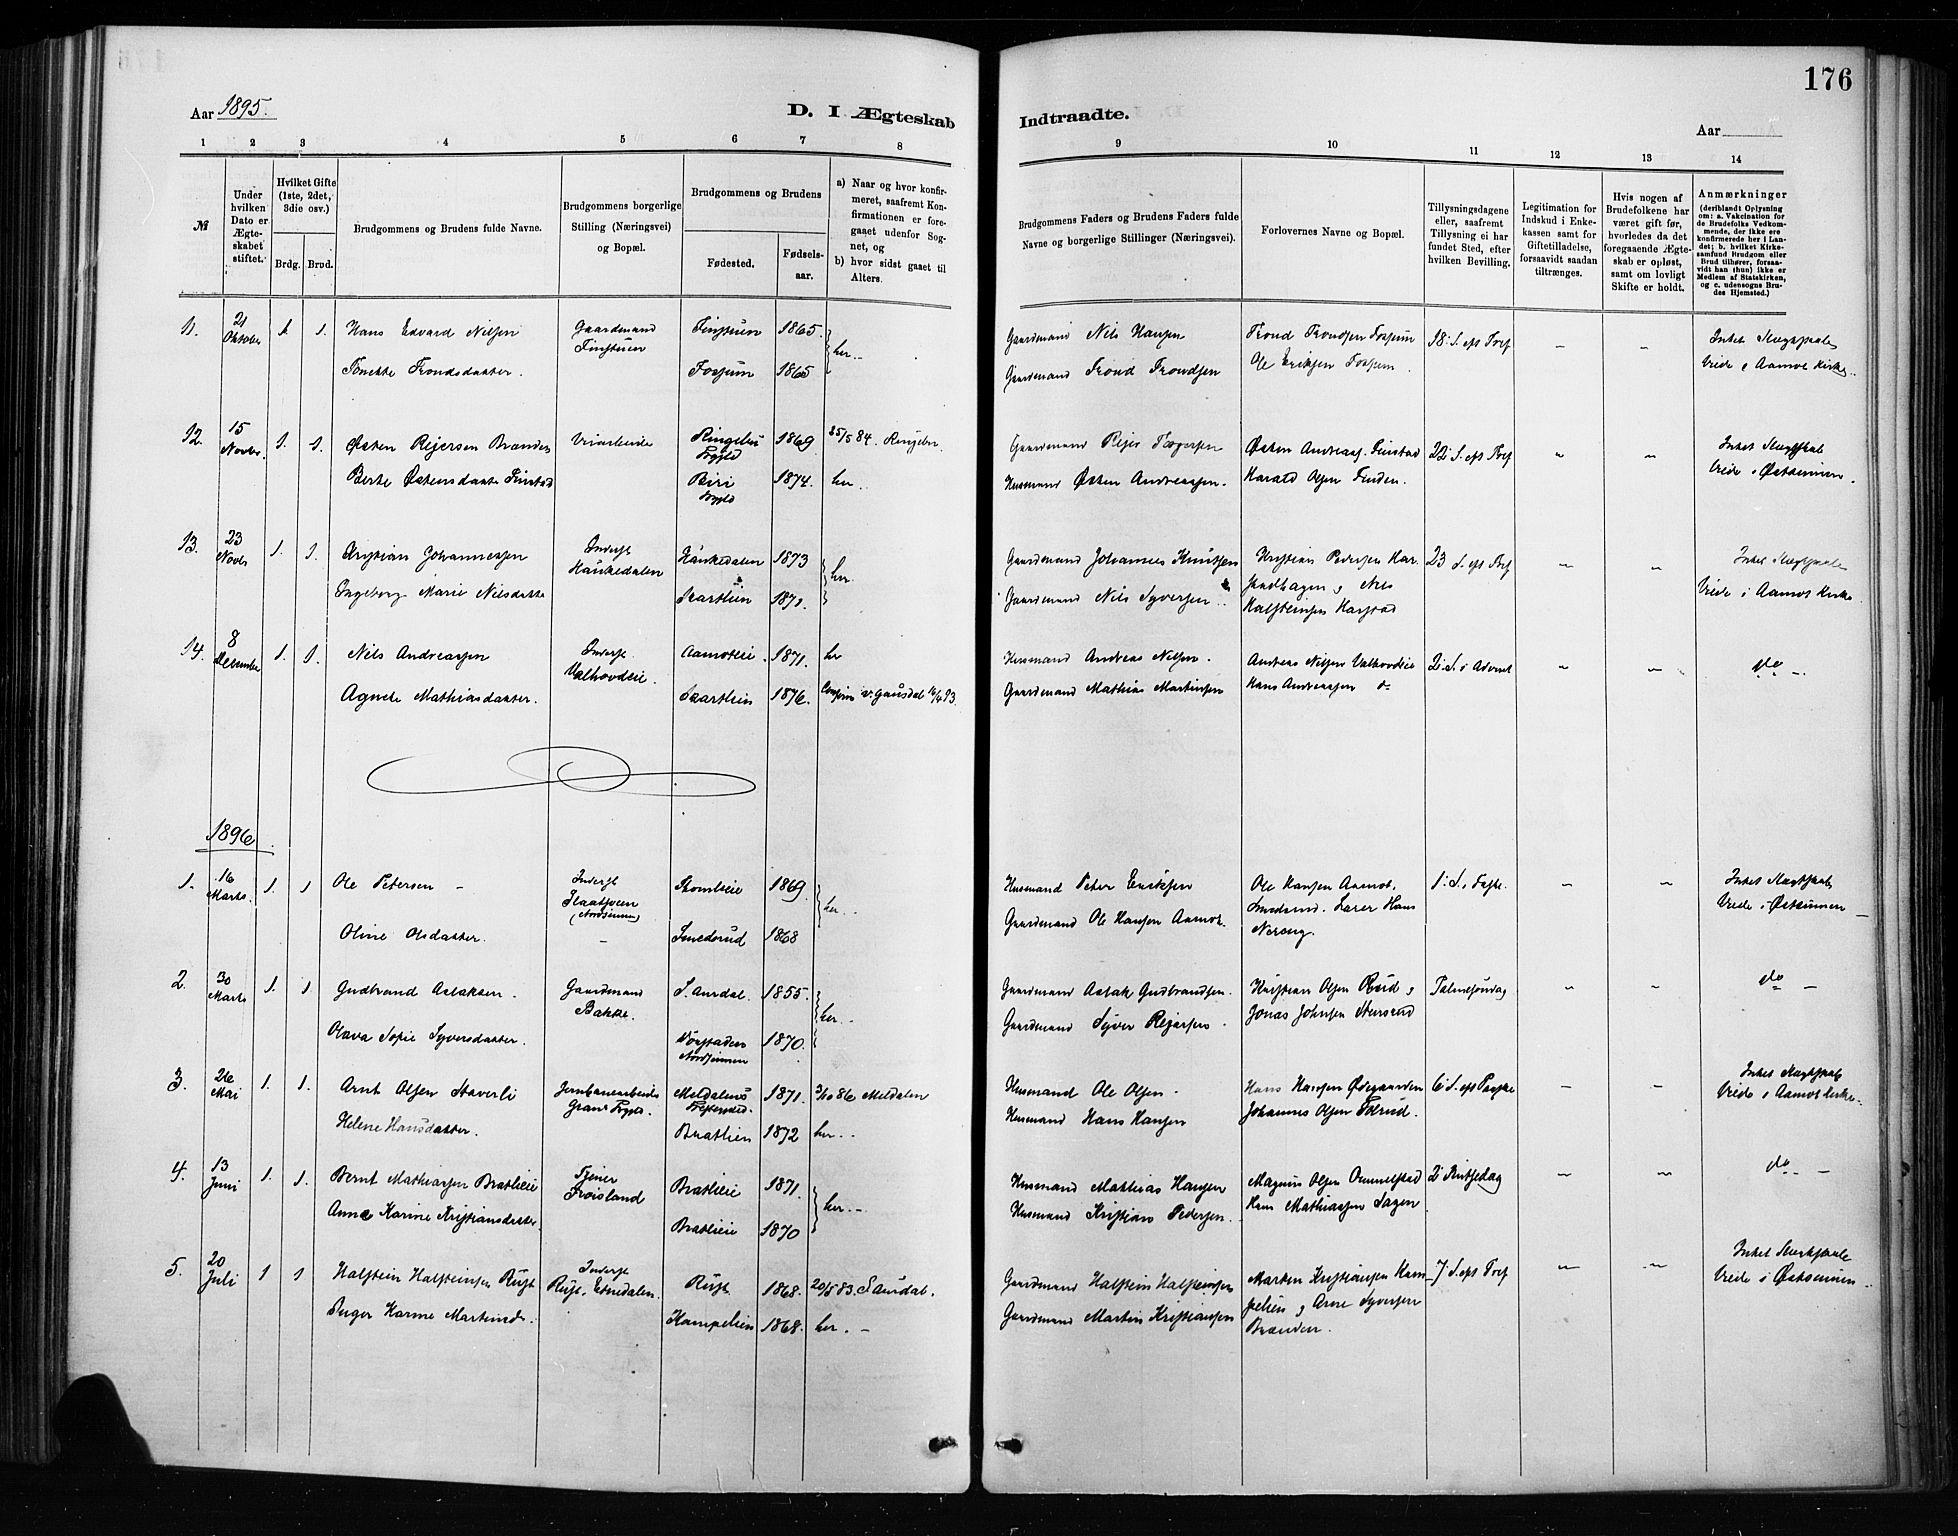 SAH, Nordre Land prestekontor, Ministerialbok nr. 4, 1882-1896, s. 176